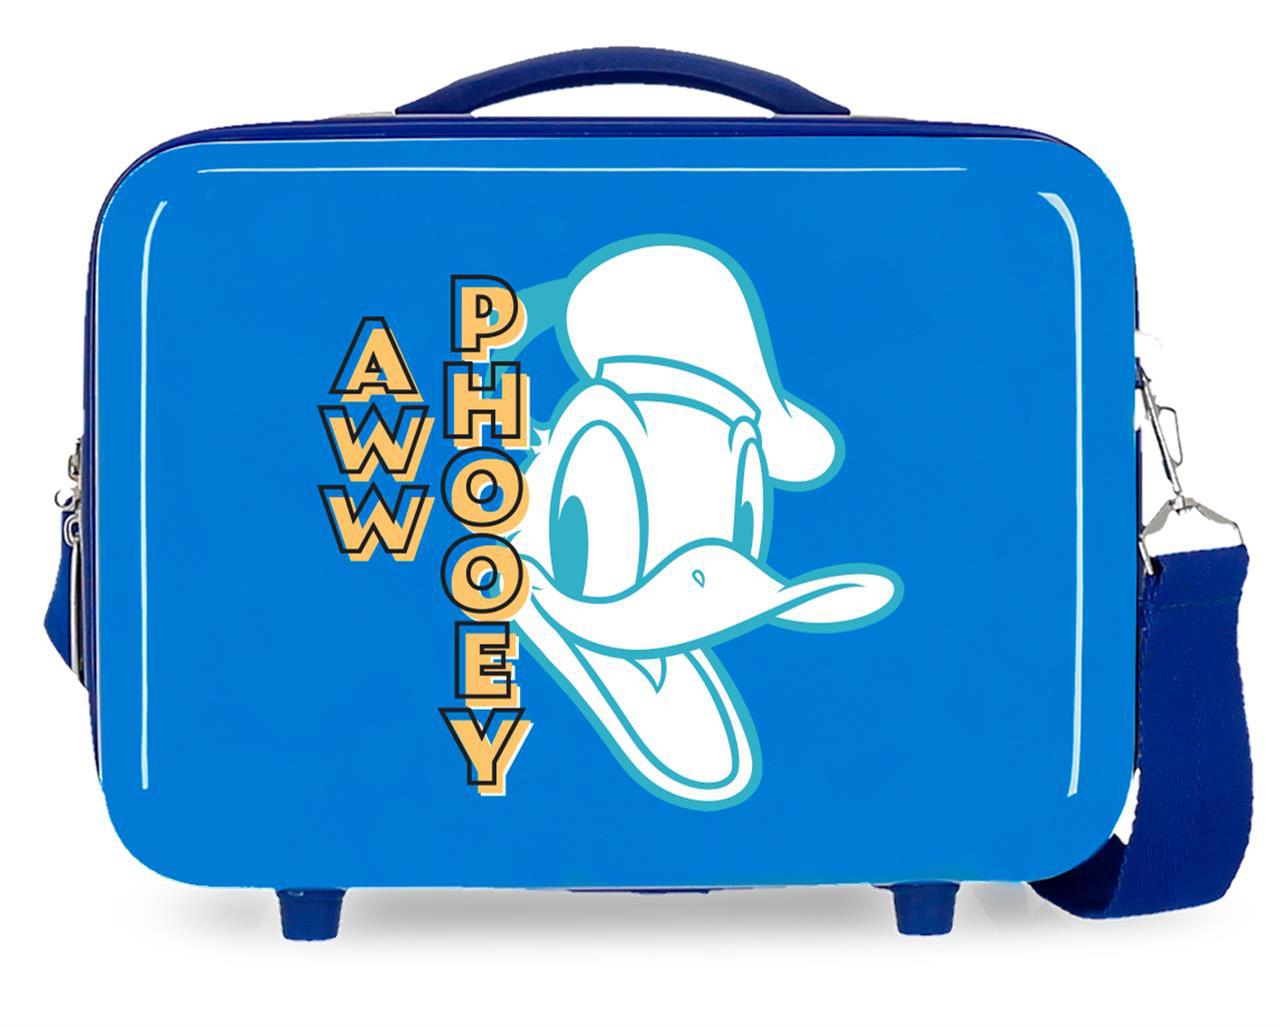 2293923 Neceser Donald Aww Phooey